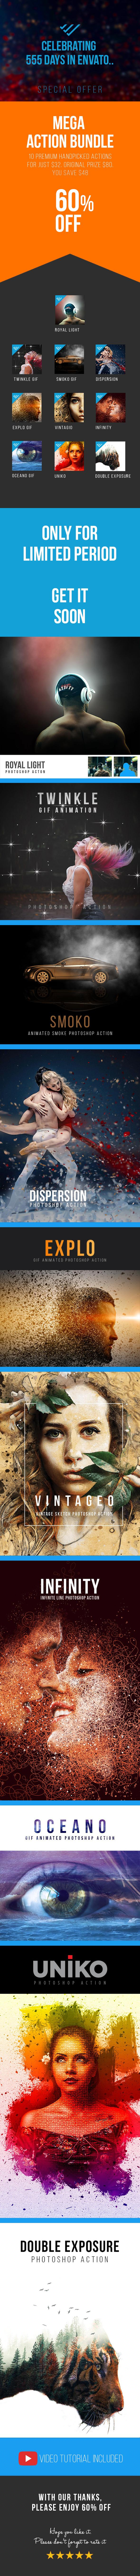 Mega Action Bundle - Walllow - Photo Effects Actions